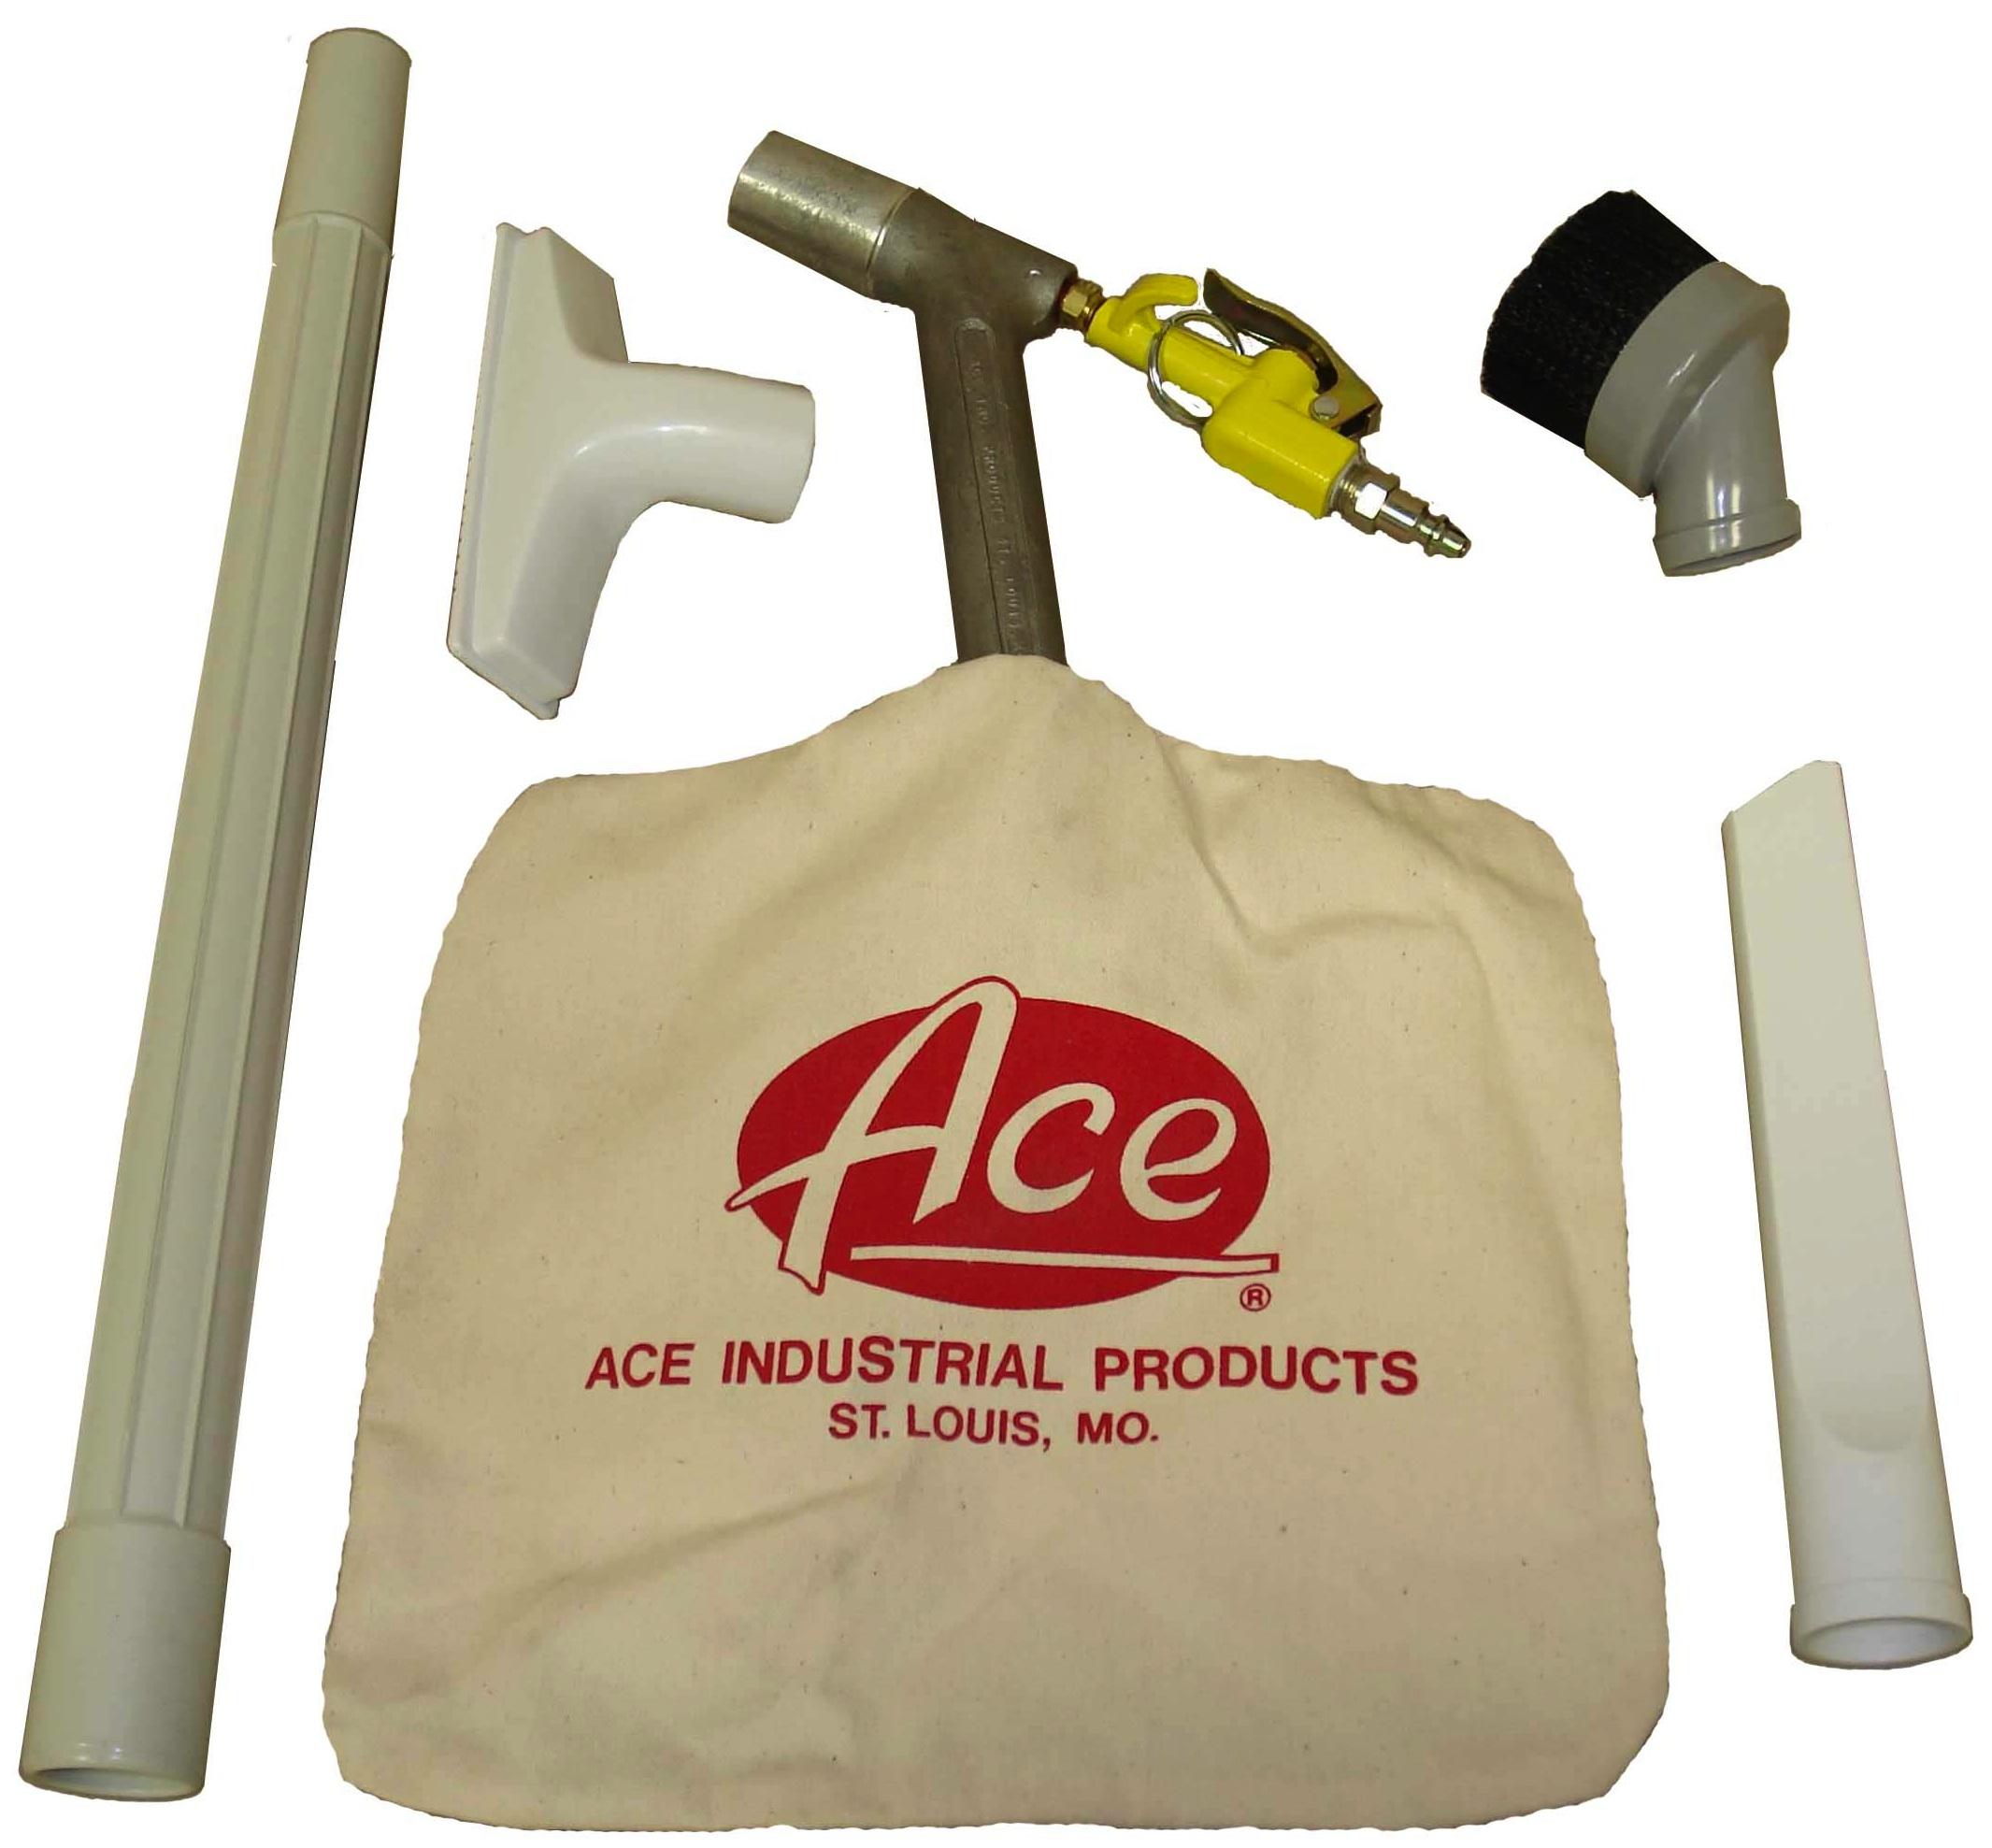 80 201 Compressed Air Handheld Vacuum Tool Ace